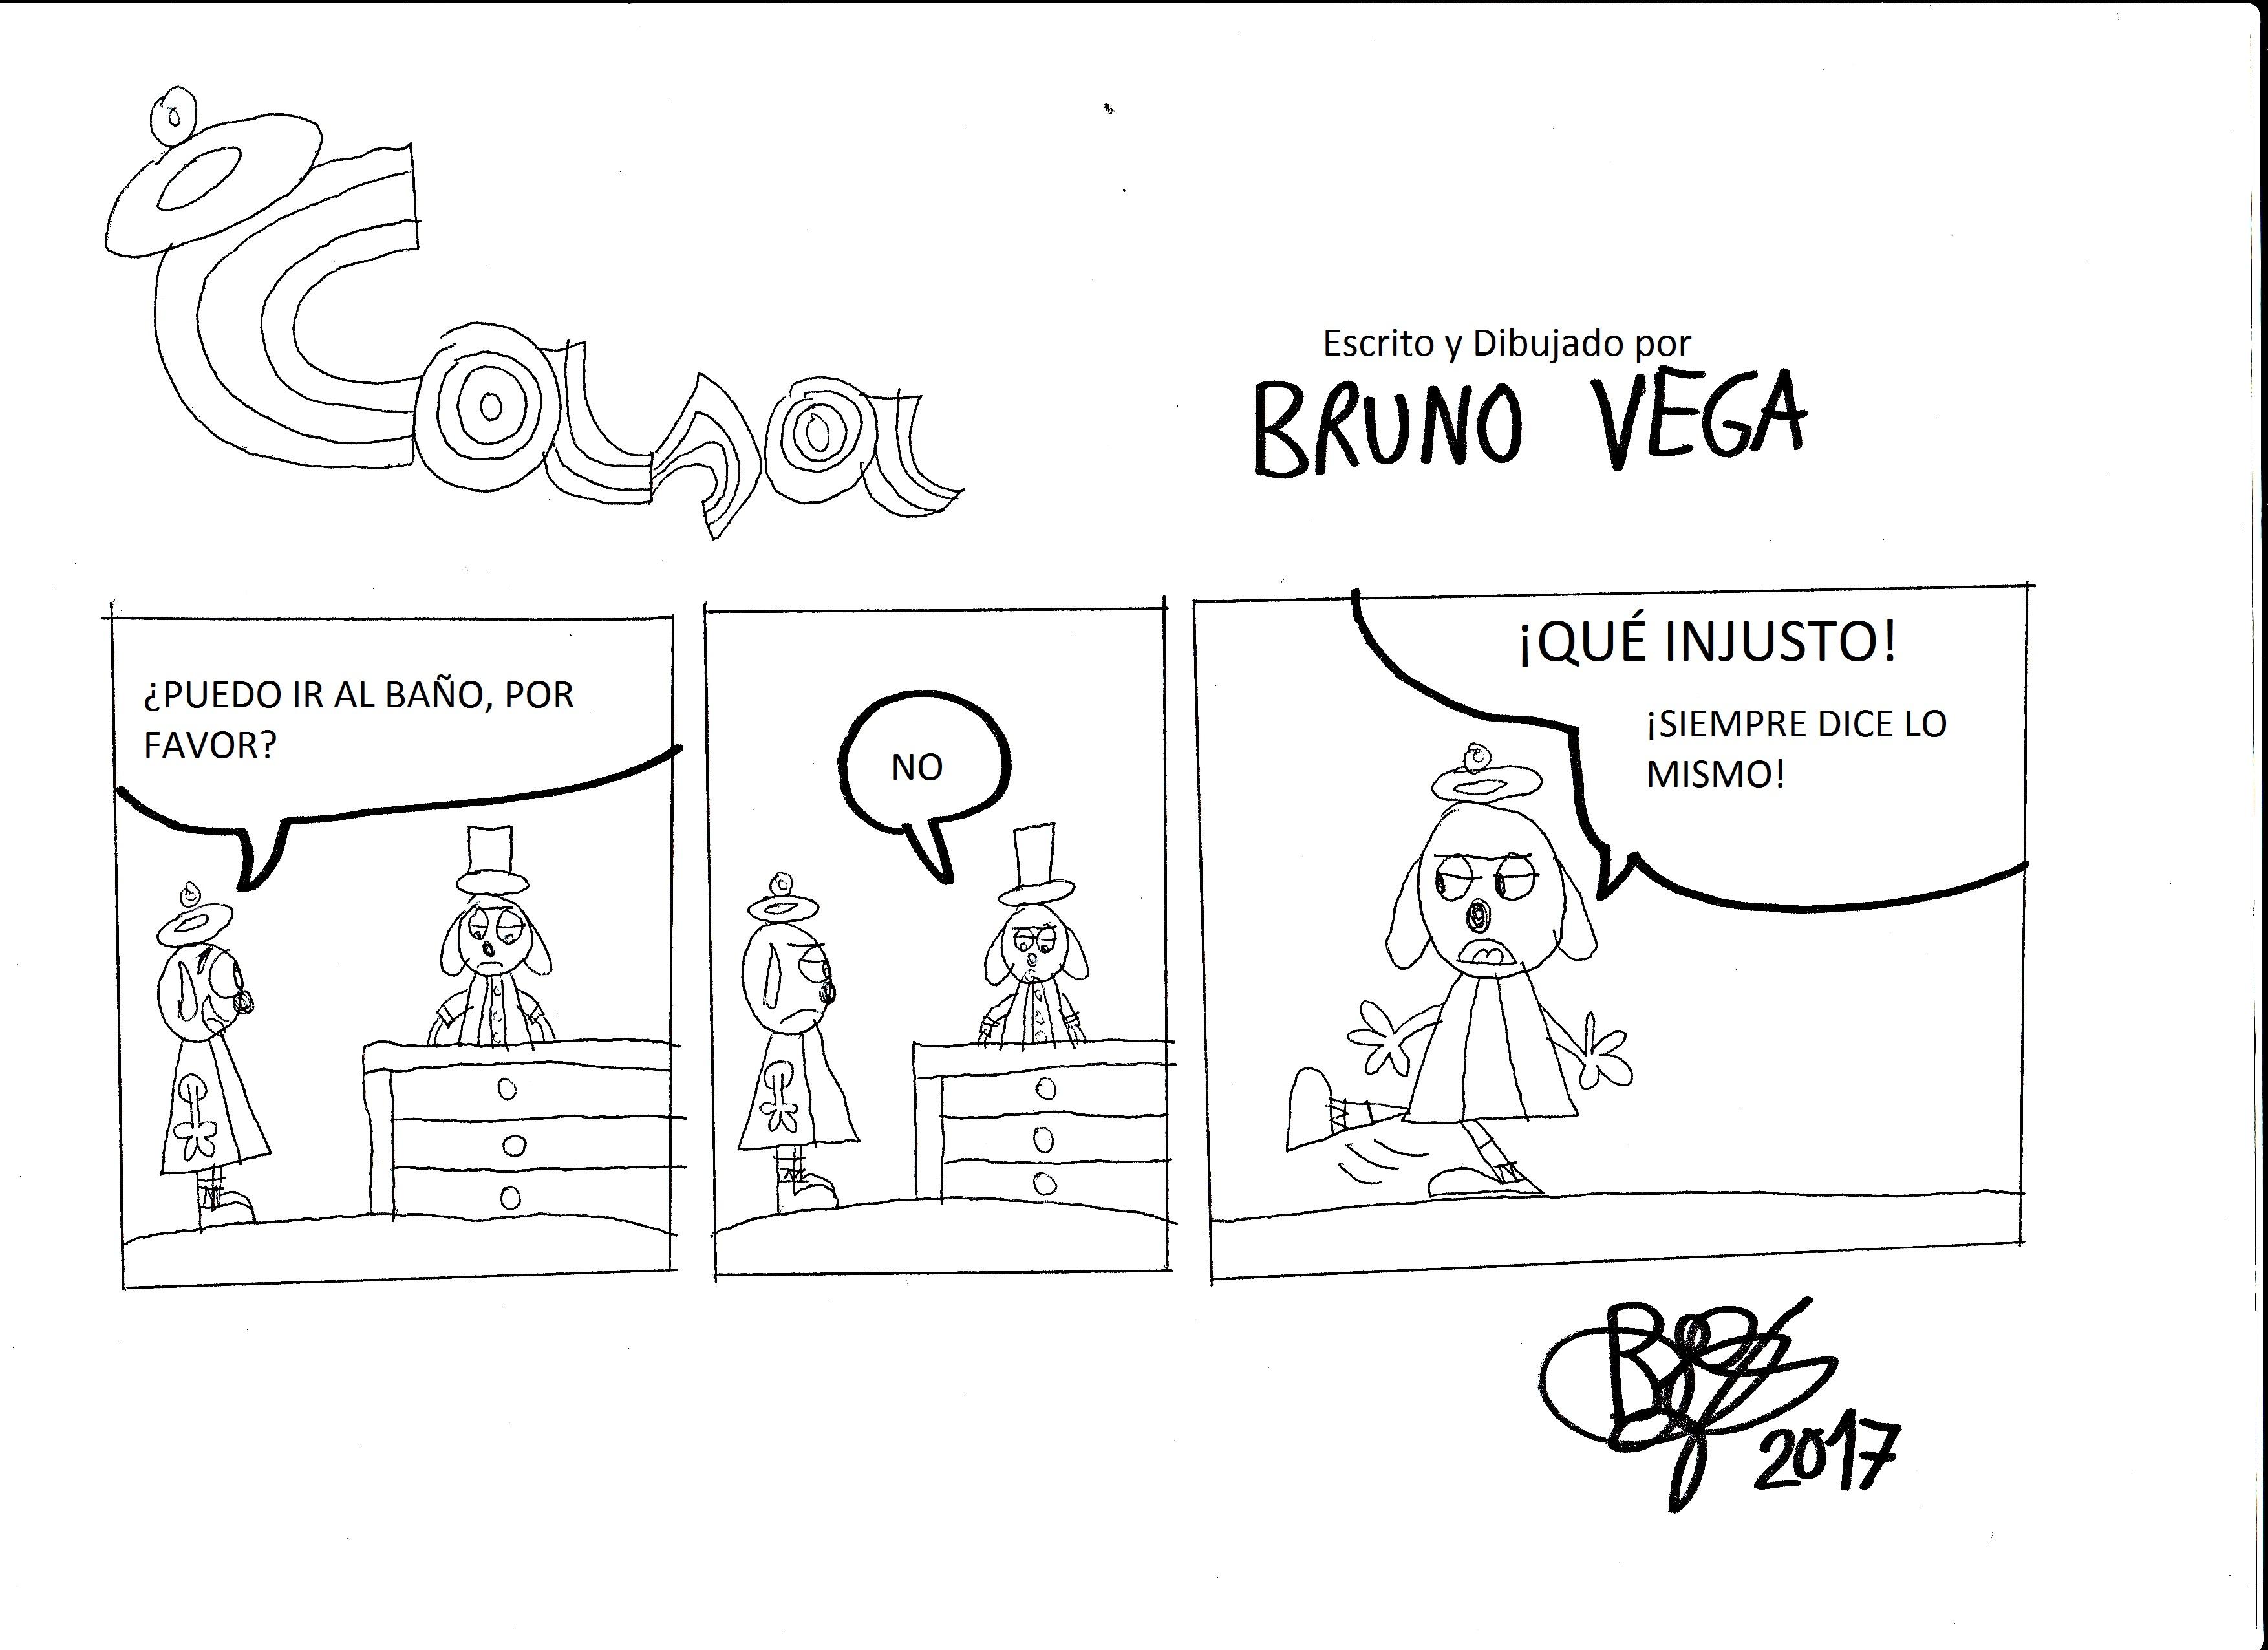 Casa Can I Go To The Bathroom Spanish Version By Brunovega On Deviantart